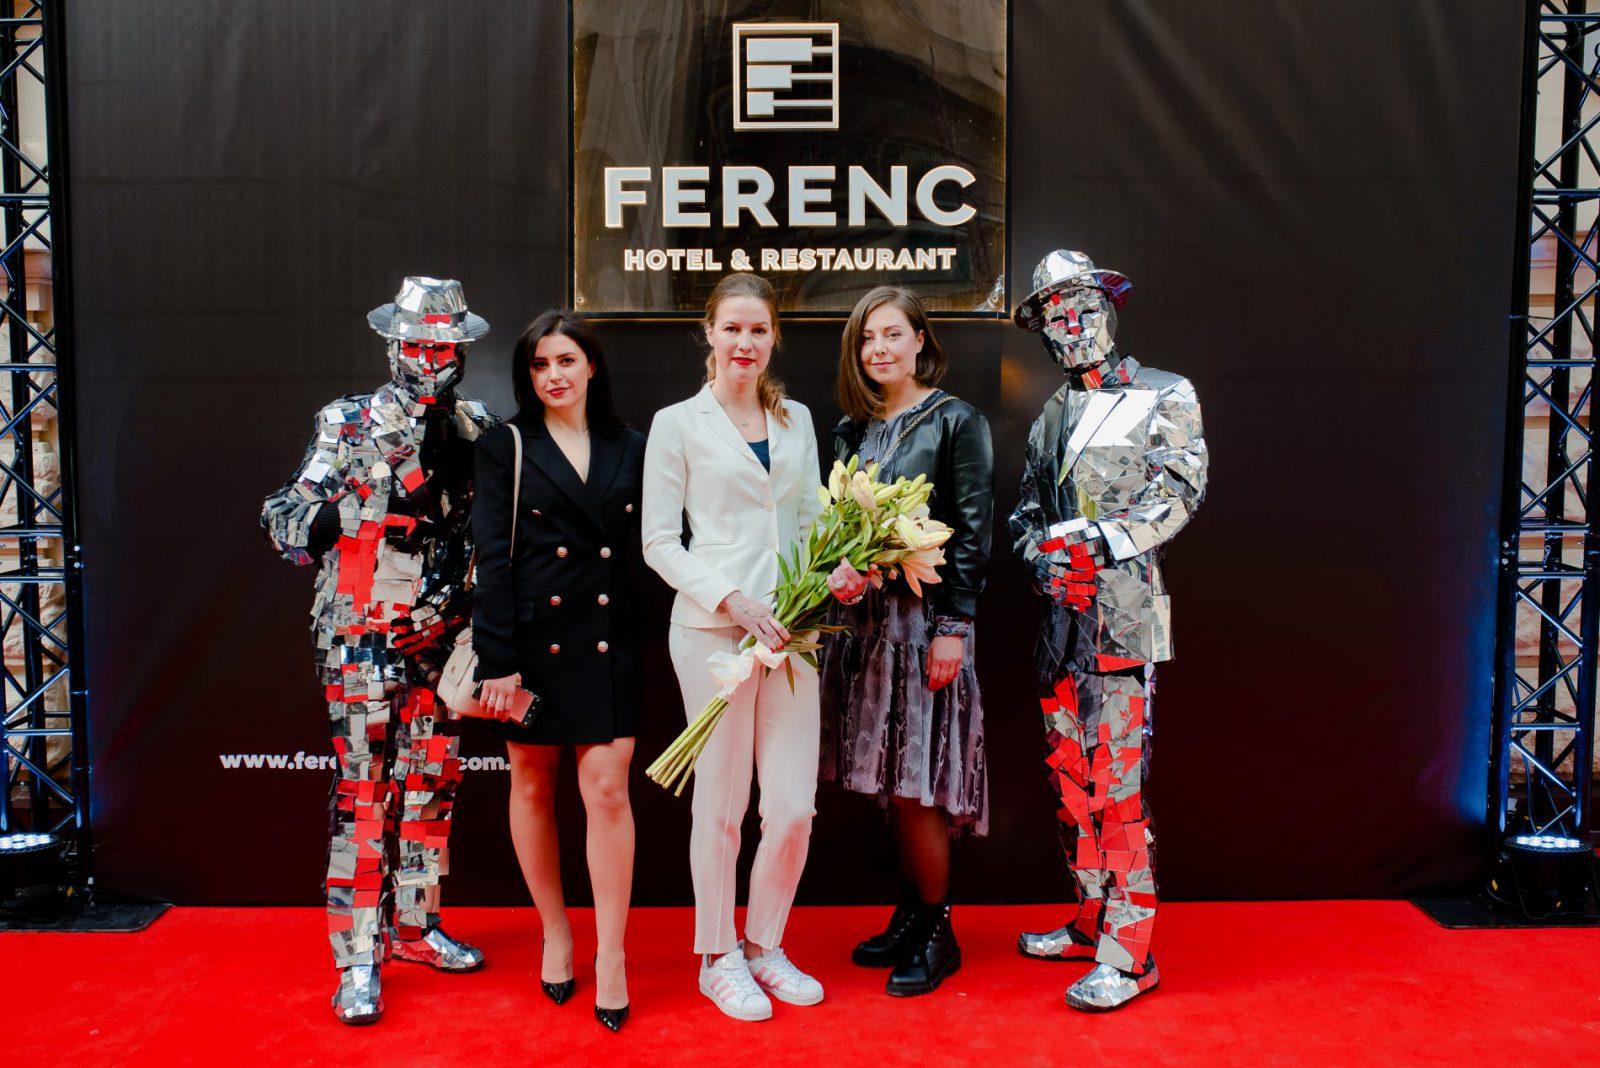 Ferenc0169